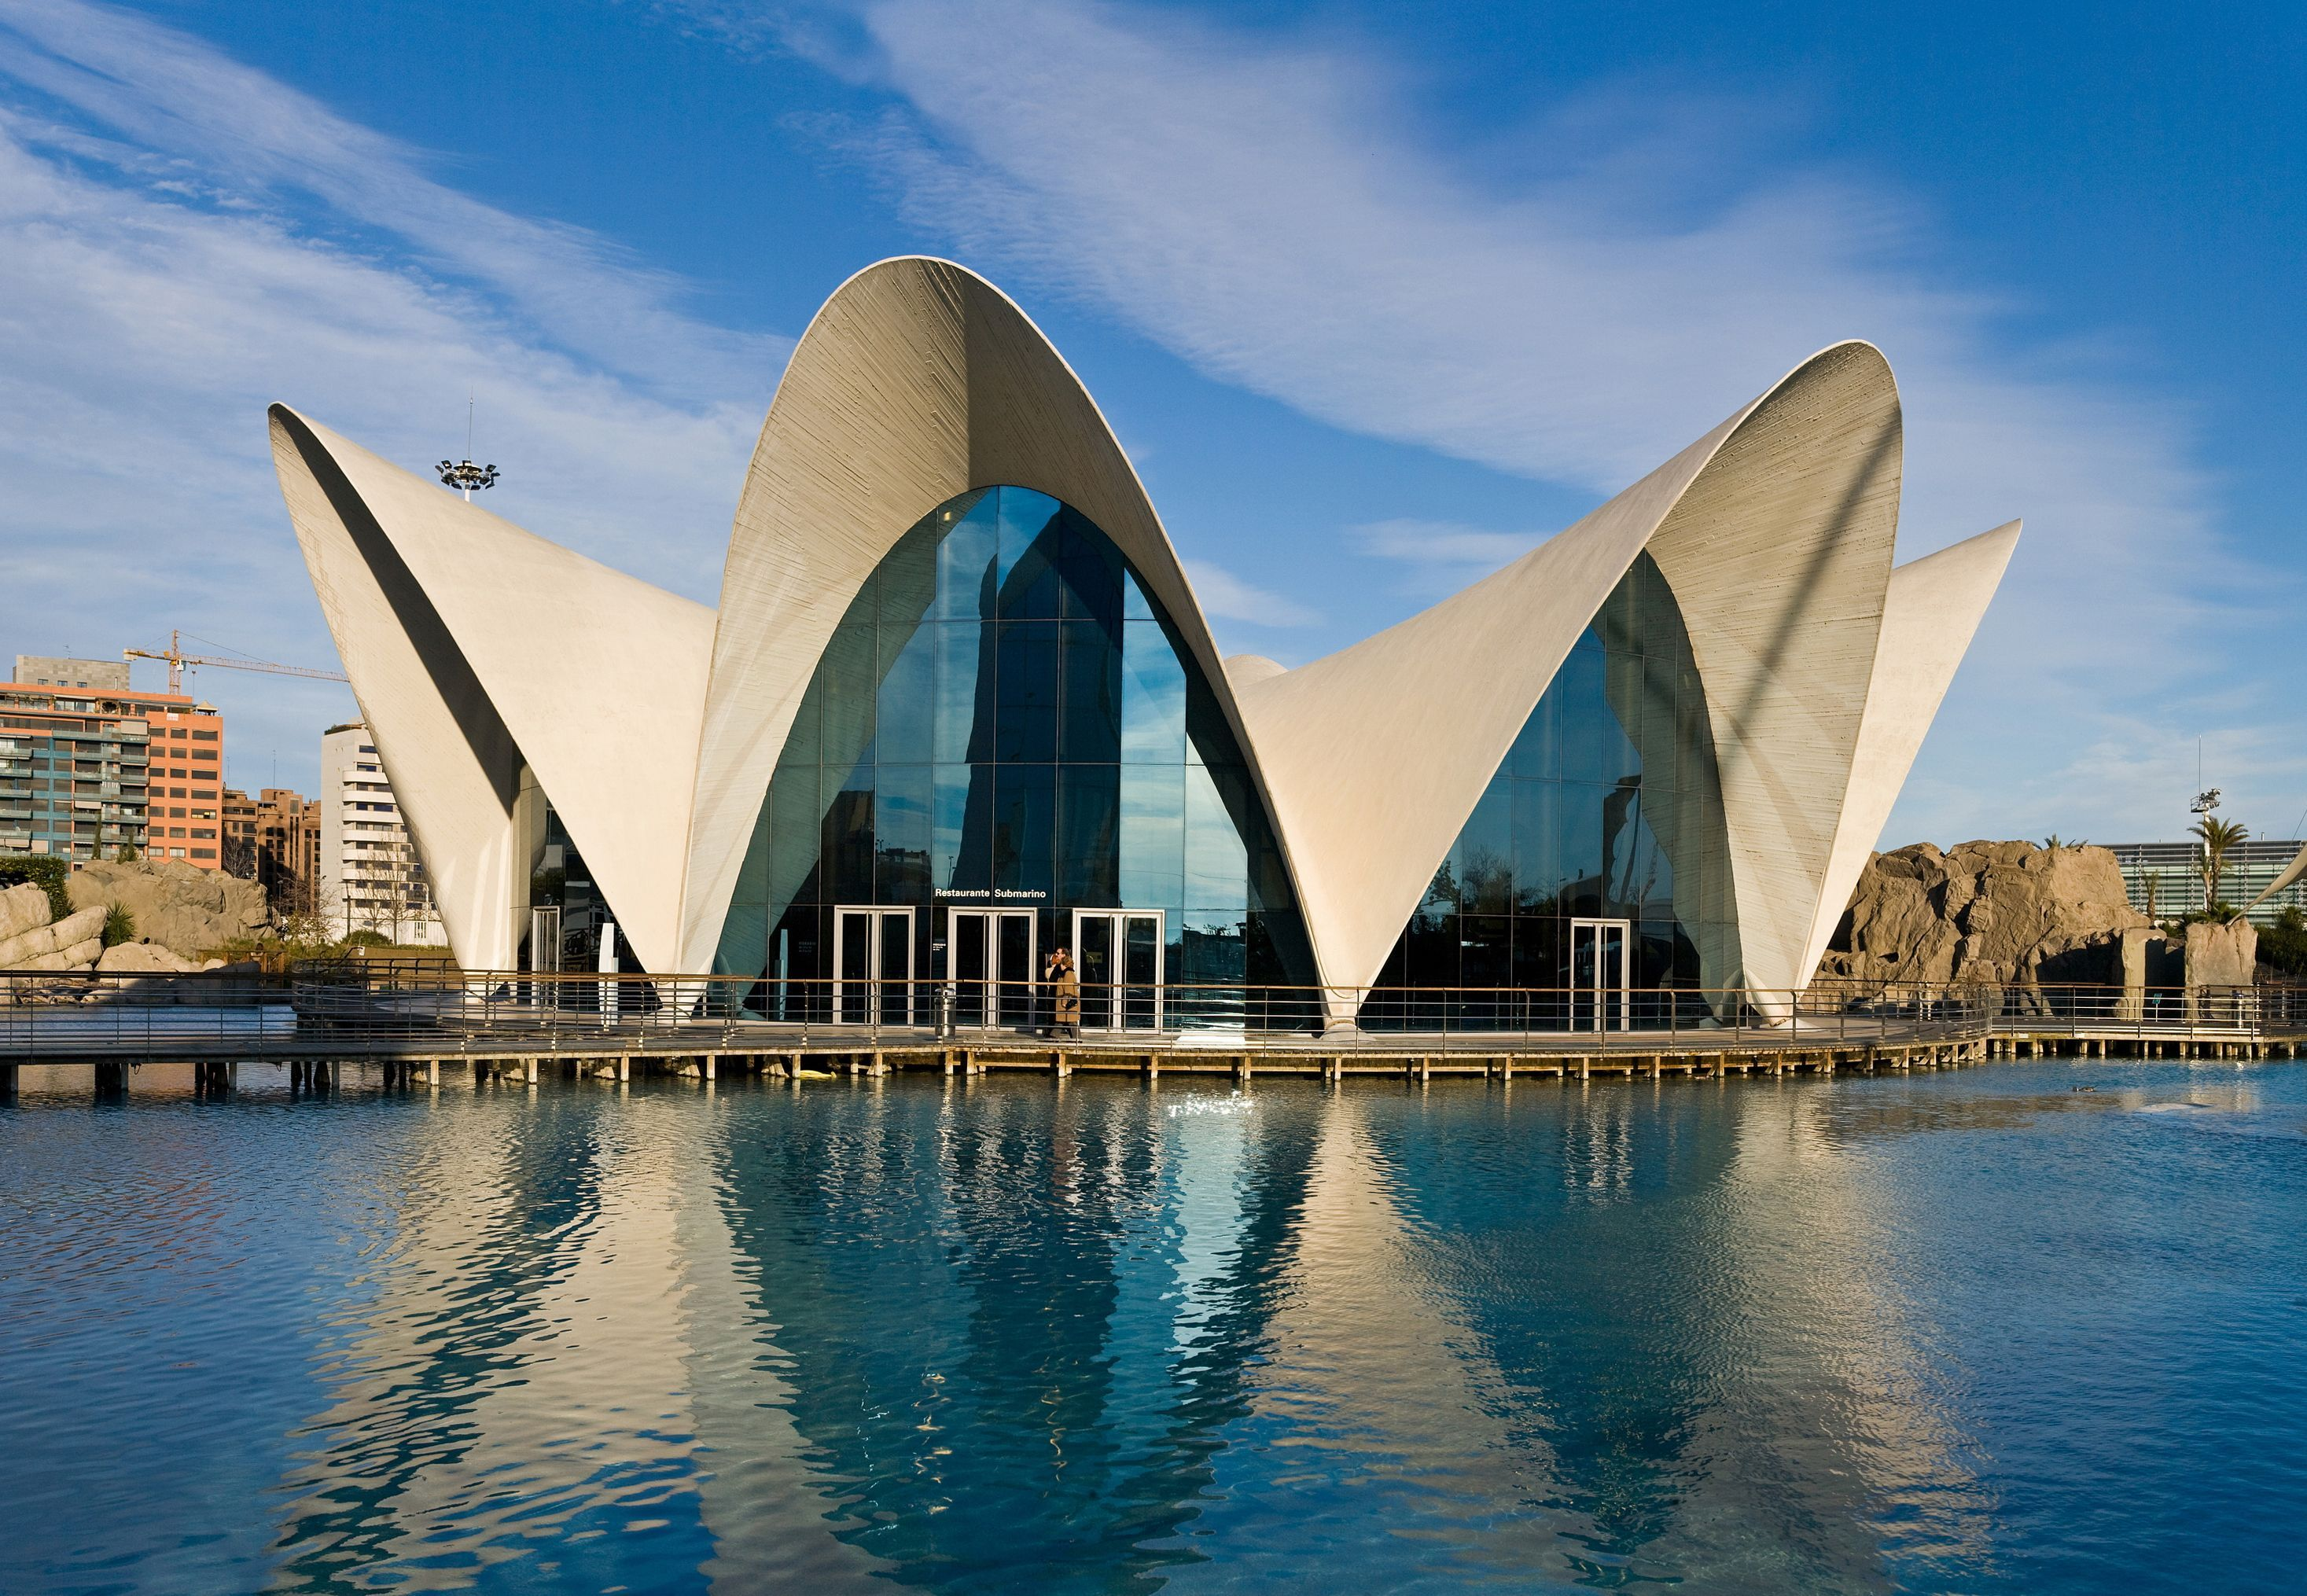 L'Oceanografic, Valencia Spain   Spain road trip, Valencia spain, Valencia